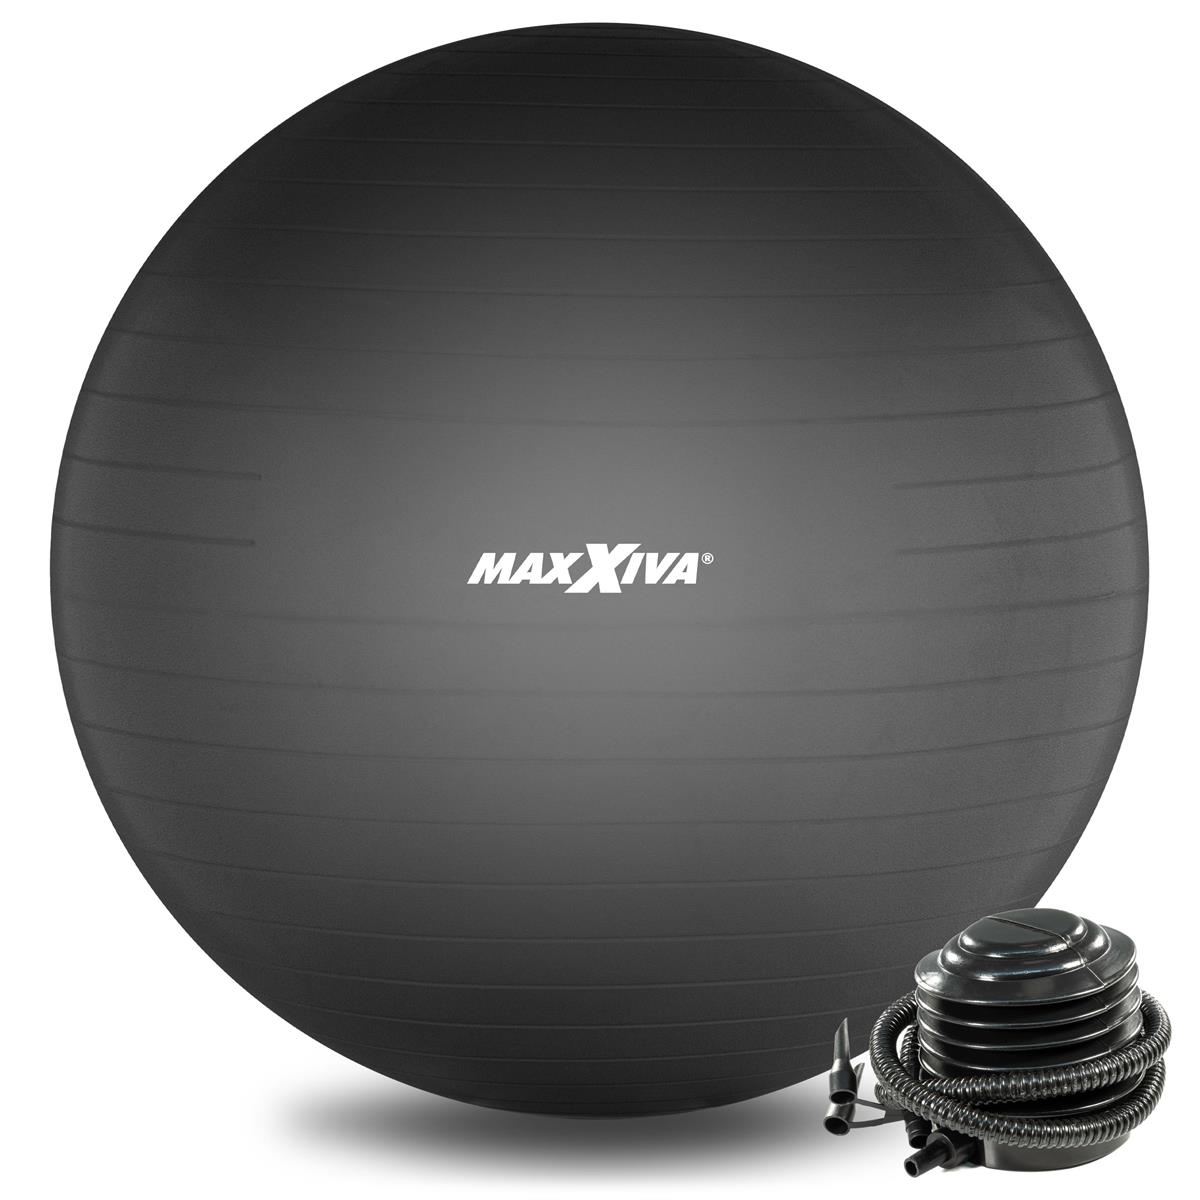 MAXXIVA Gymnastikball Ø 75 cm Schwarz mit Pumpe Sitzball Fitness Yoga Pilates